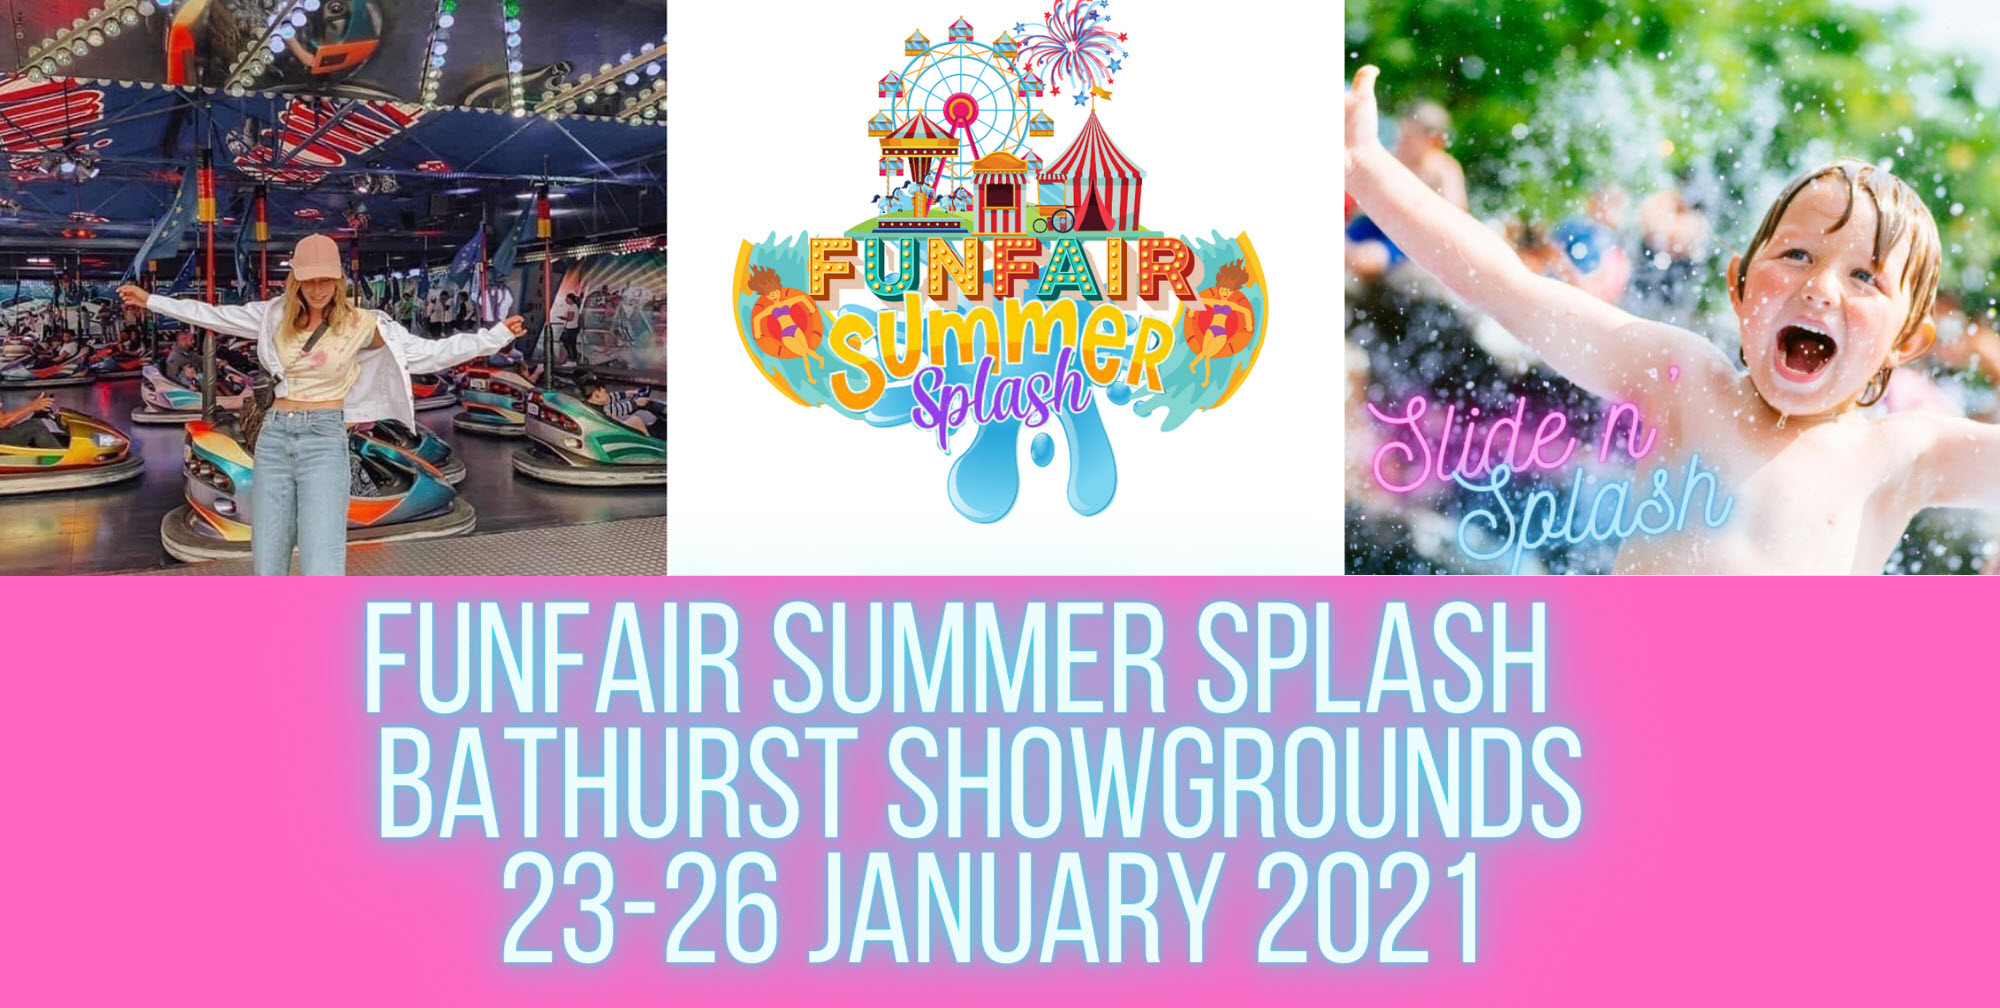 Bathurst FunFair Summer Splash   TUESDAY 26 JAN 2021